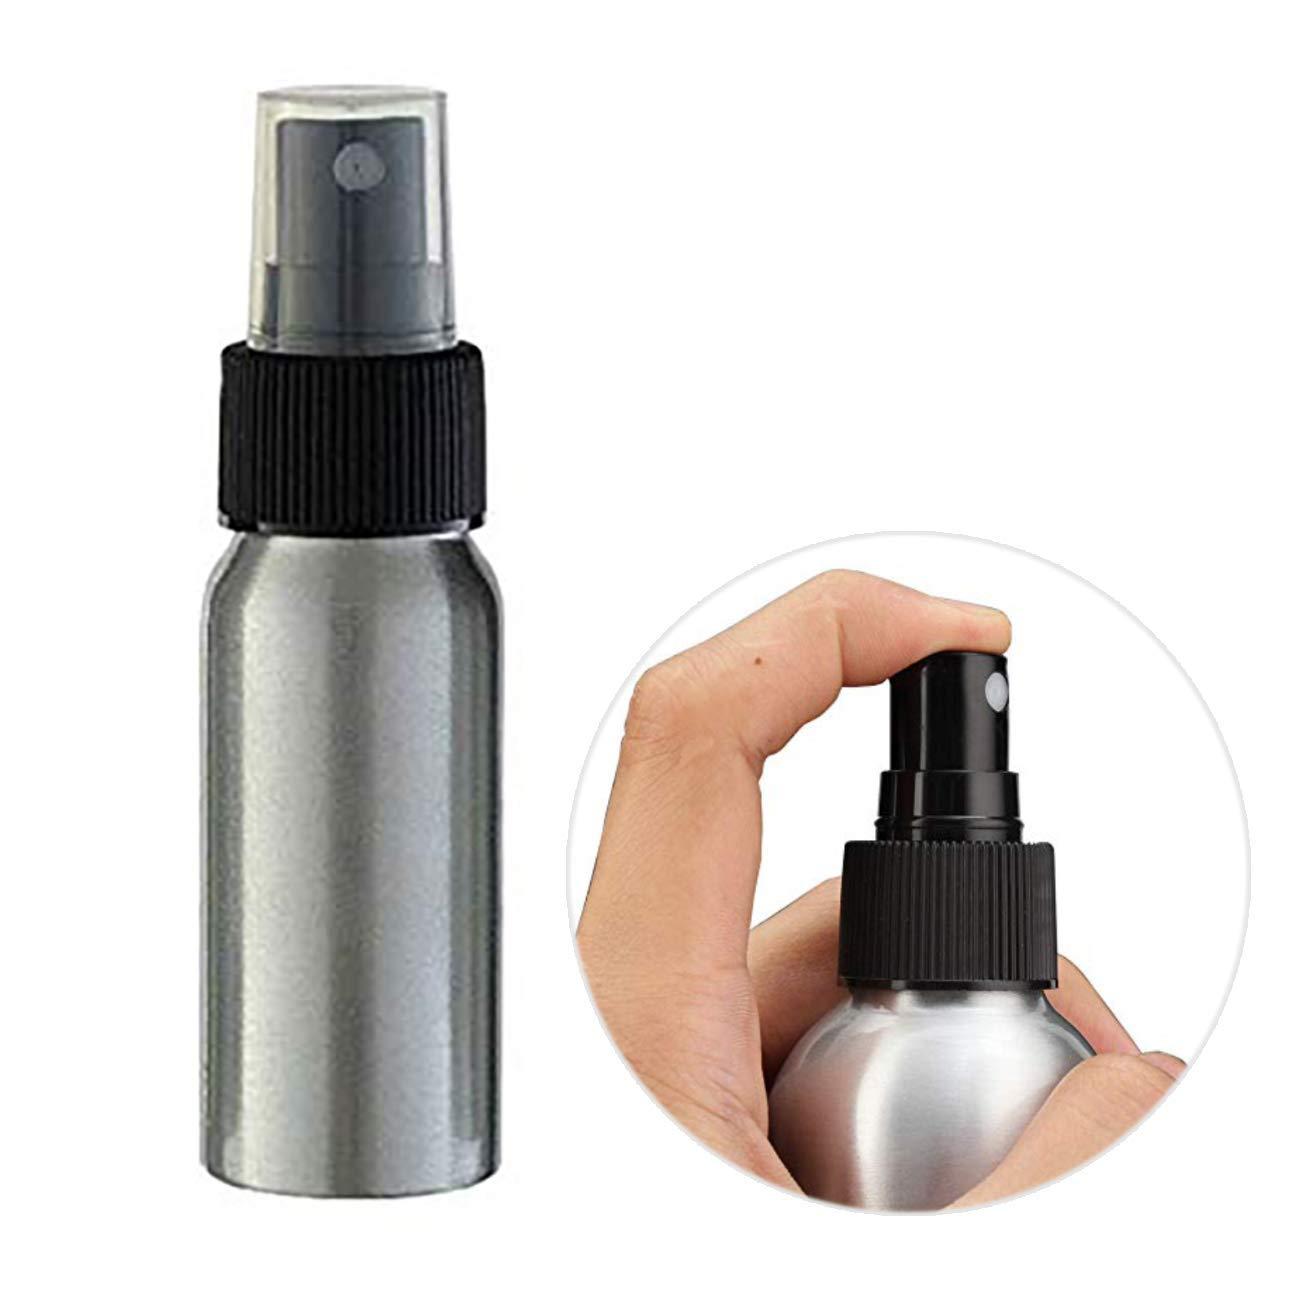 Uheng 20 Pack 5oz Aluminium Essential Oil Spray Bottles Refillable Perfume Fine Mist Atomiser Empty Beauty Metal Spray Bottles Cosmetic Pack Container travel Bottles